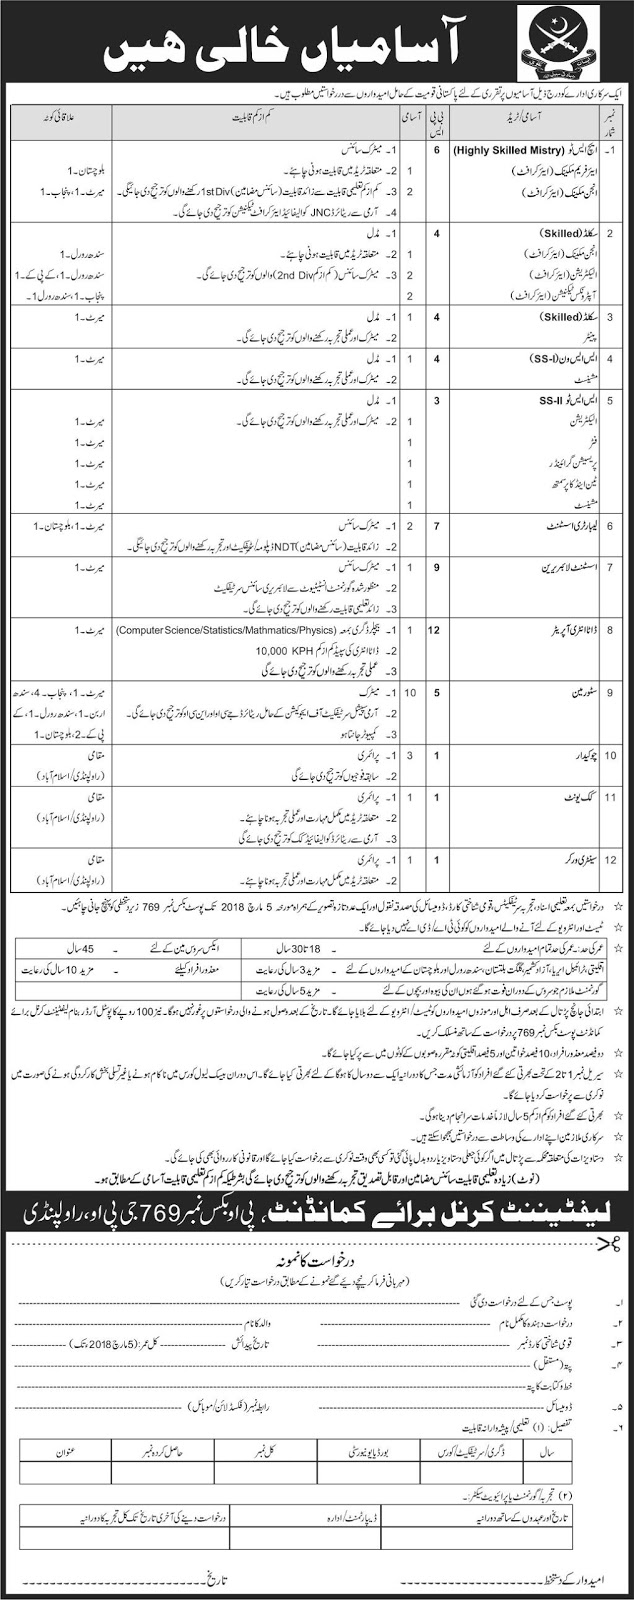 Pakistan Army Latest Jobs in Karachi 2018 for 34 Posts